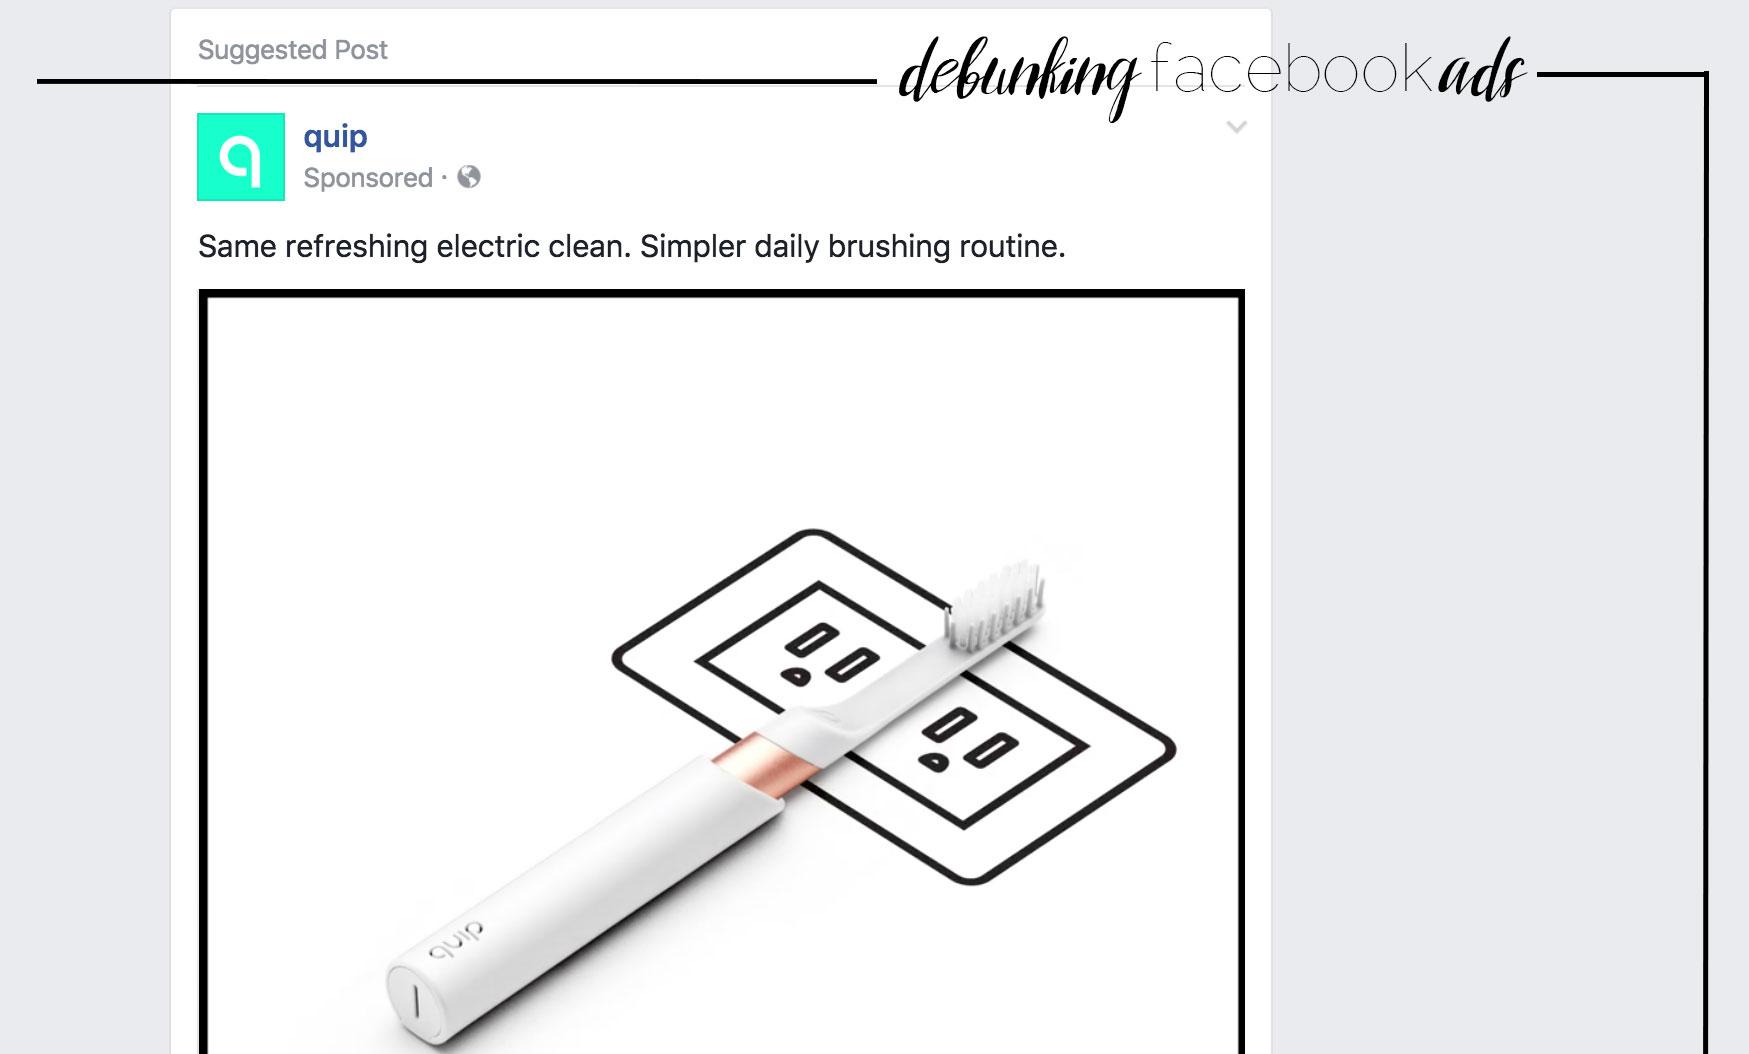 Debunking facebook ads